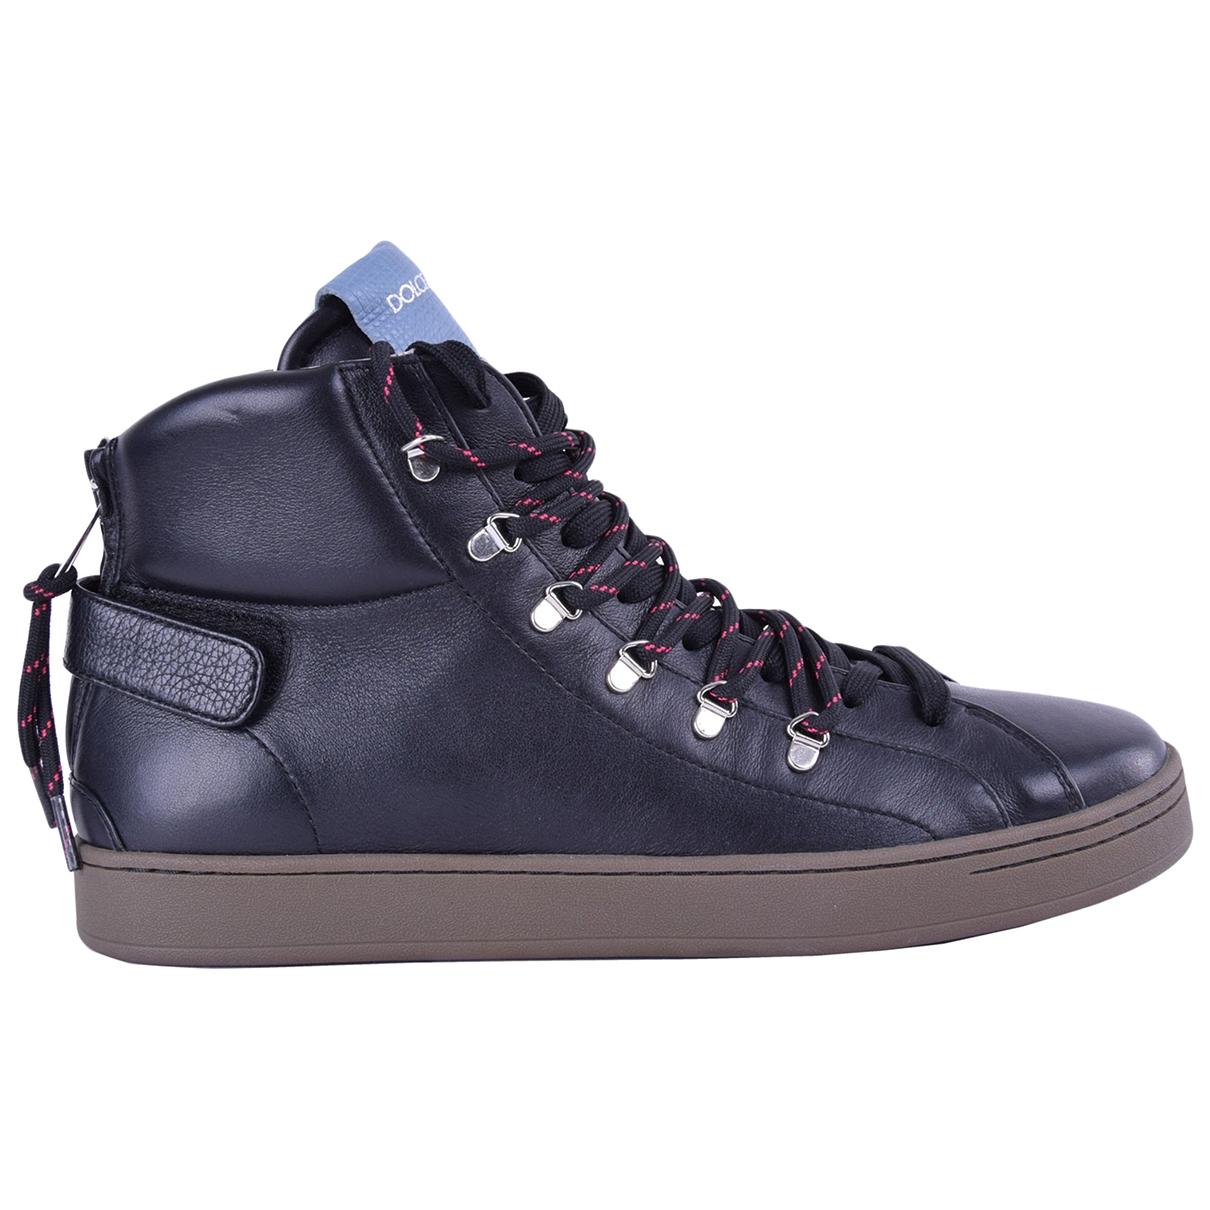 Dolce & Gabbana \N Sneakers in  Schwarz Leder